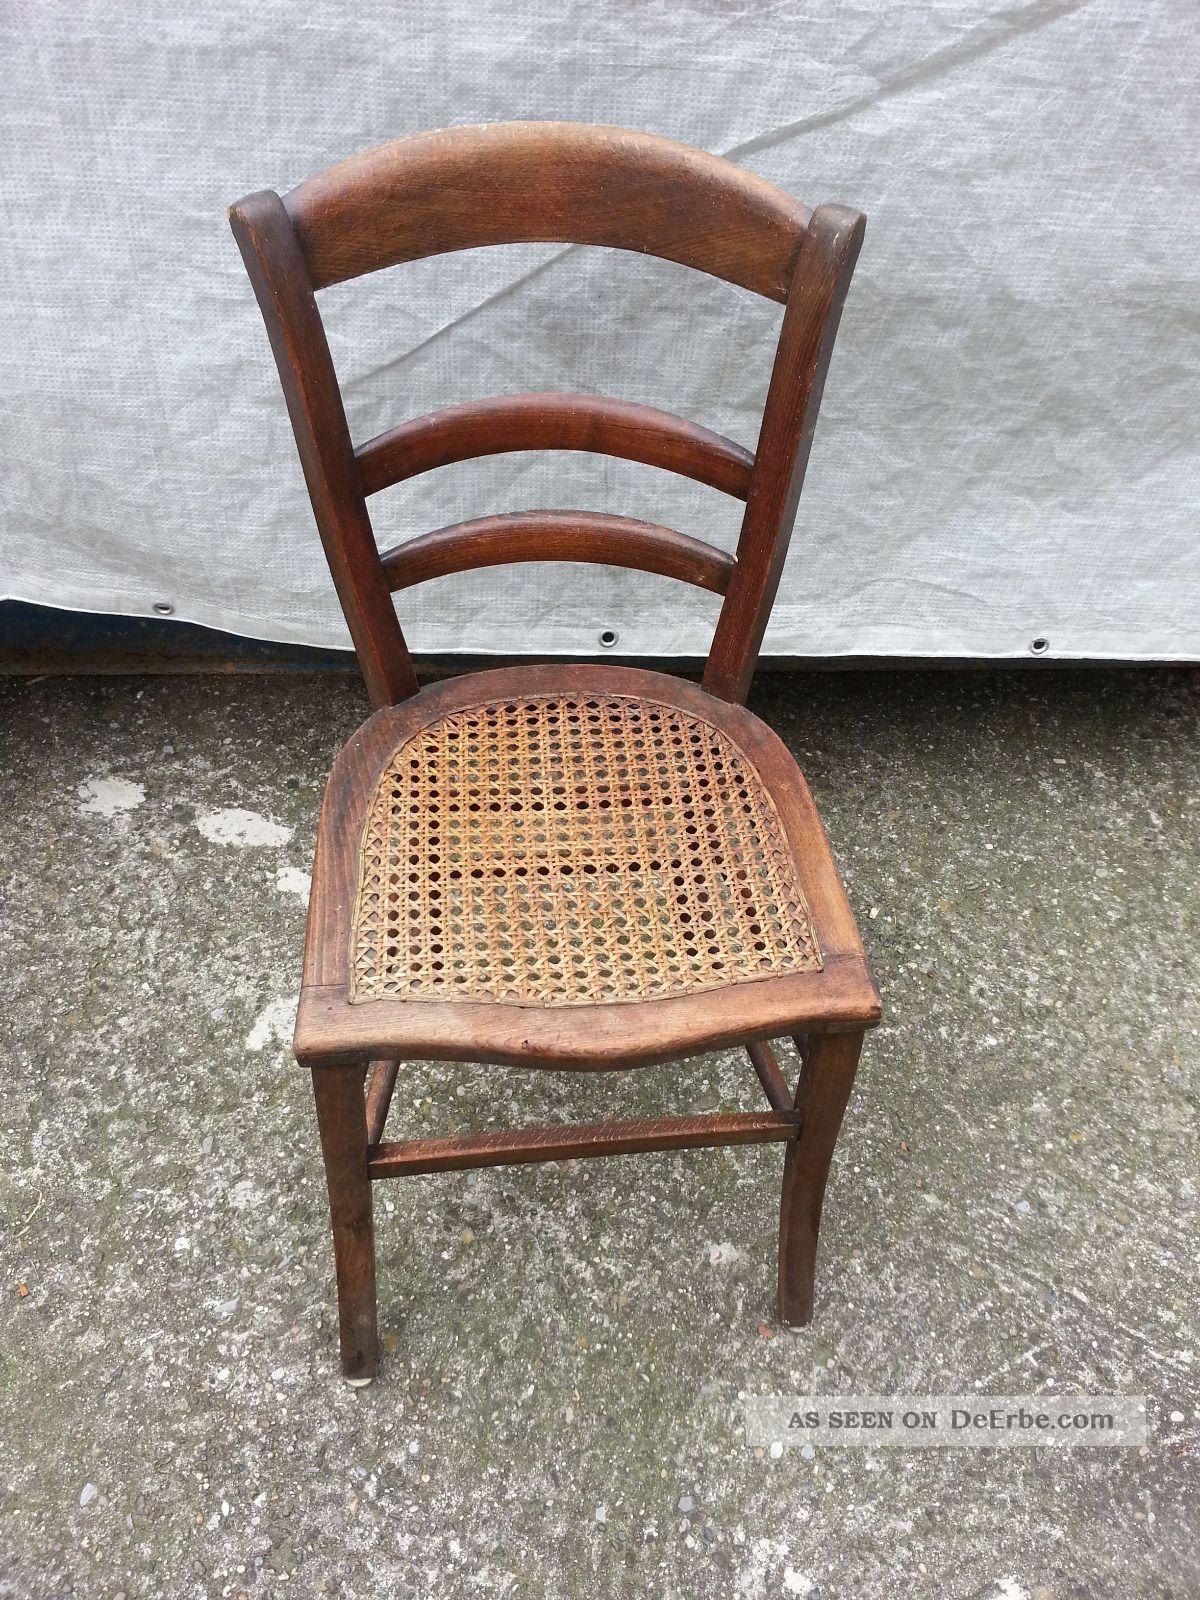 sitzflche stuhl perfect stuhl neu beziehen sitzflche entfernen with sitzflche stuhl elegant. Black Bedroom Furniture Sets. Home Design Ideas